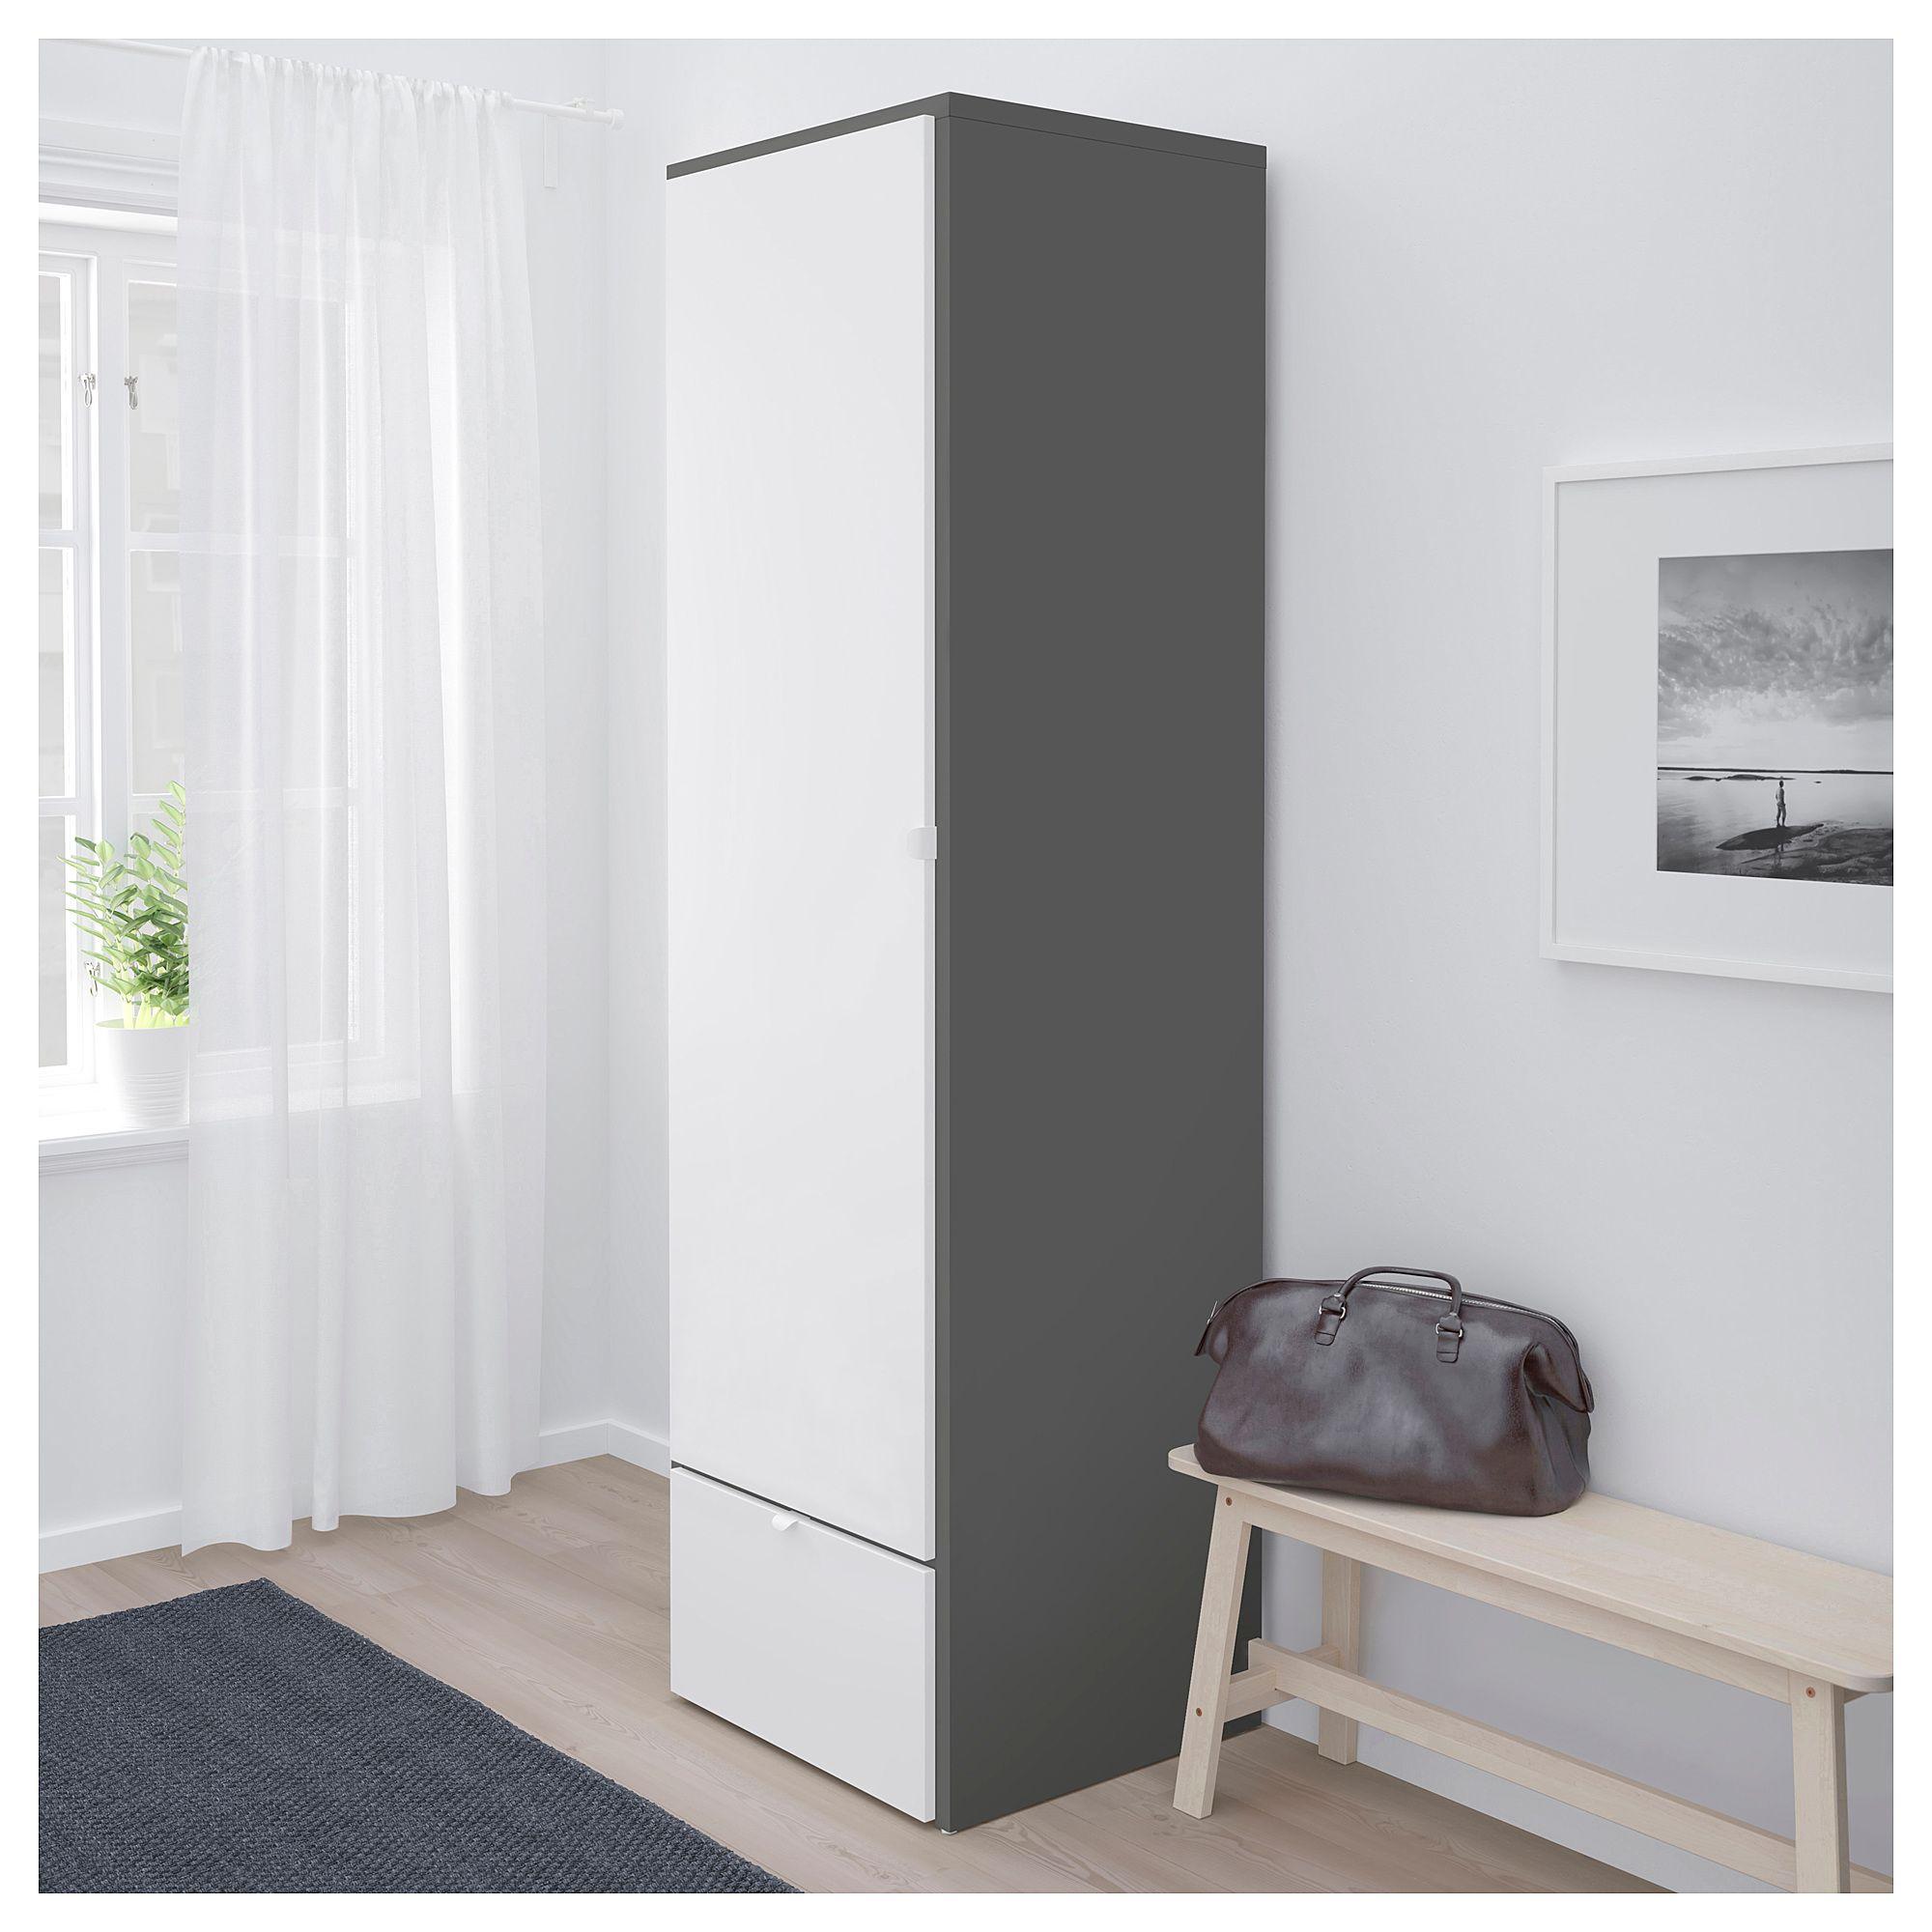 VISTHUS Wardrobe Grey white IKEA